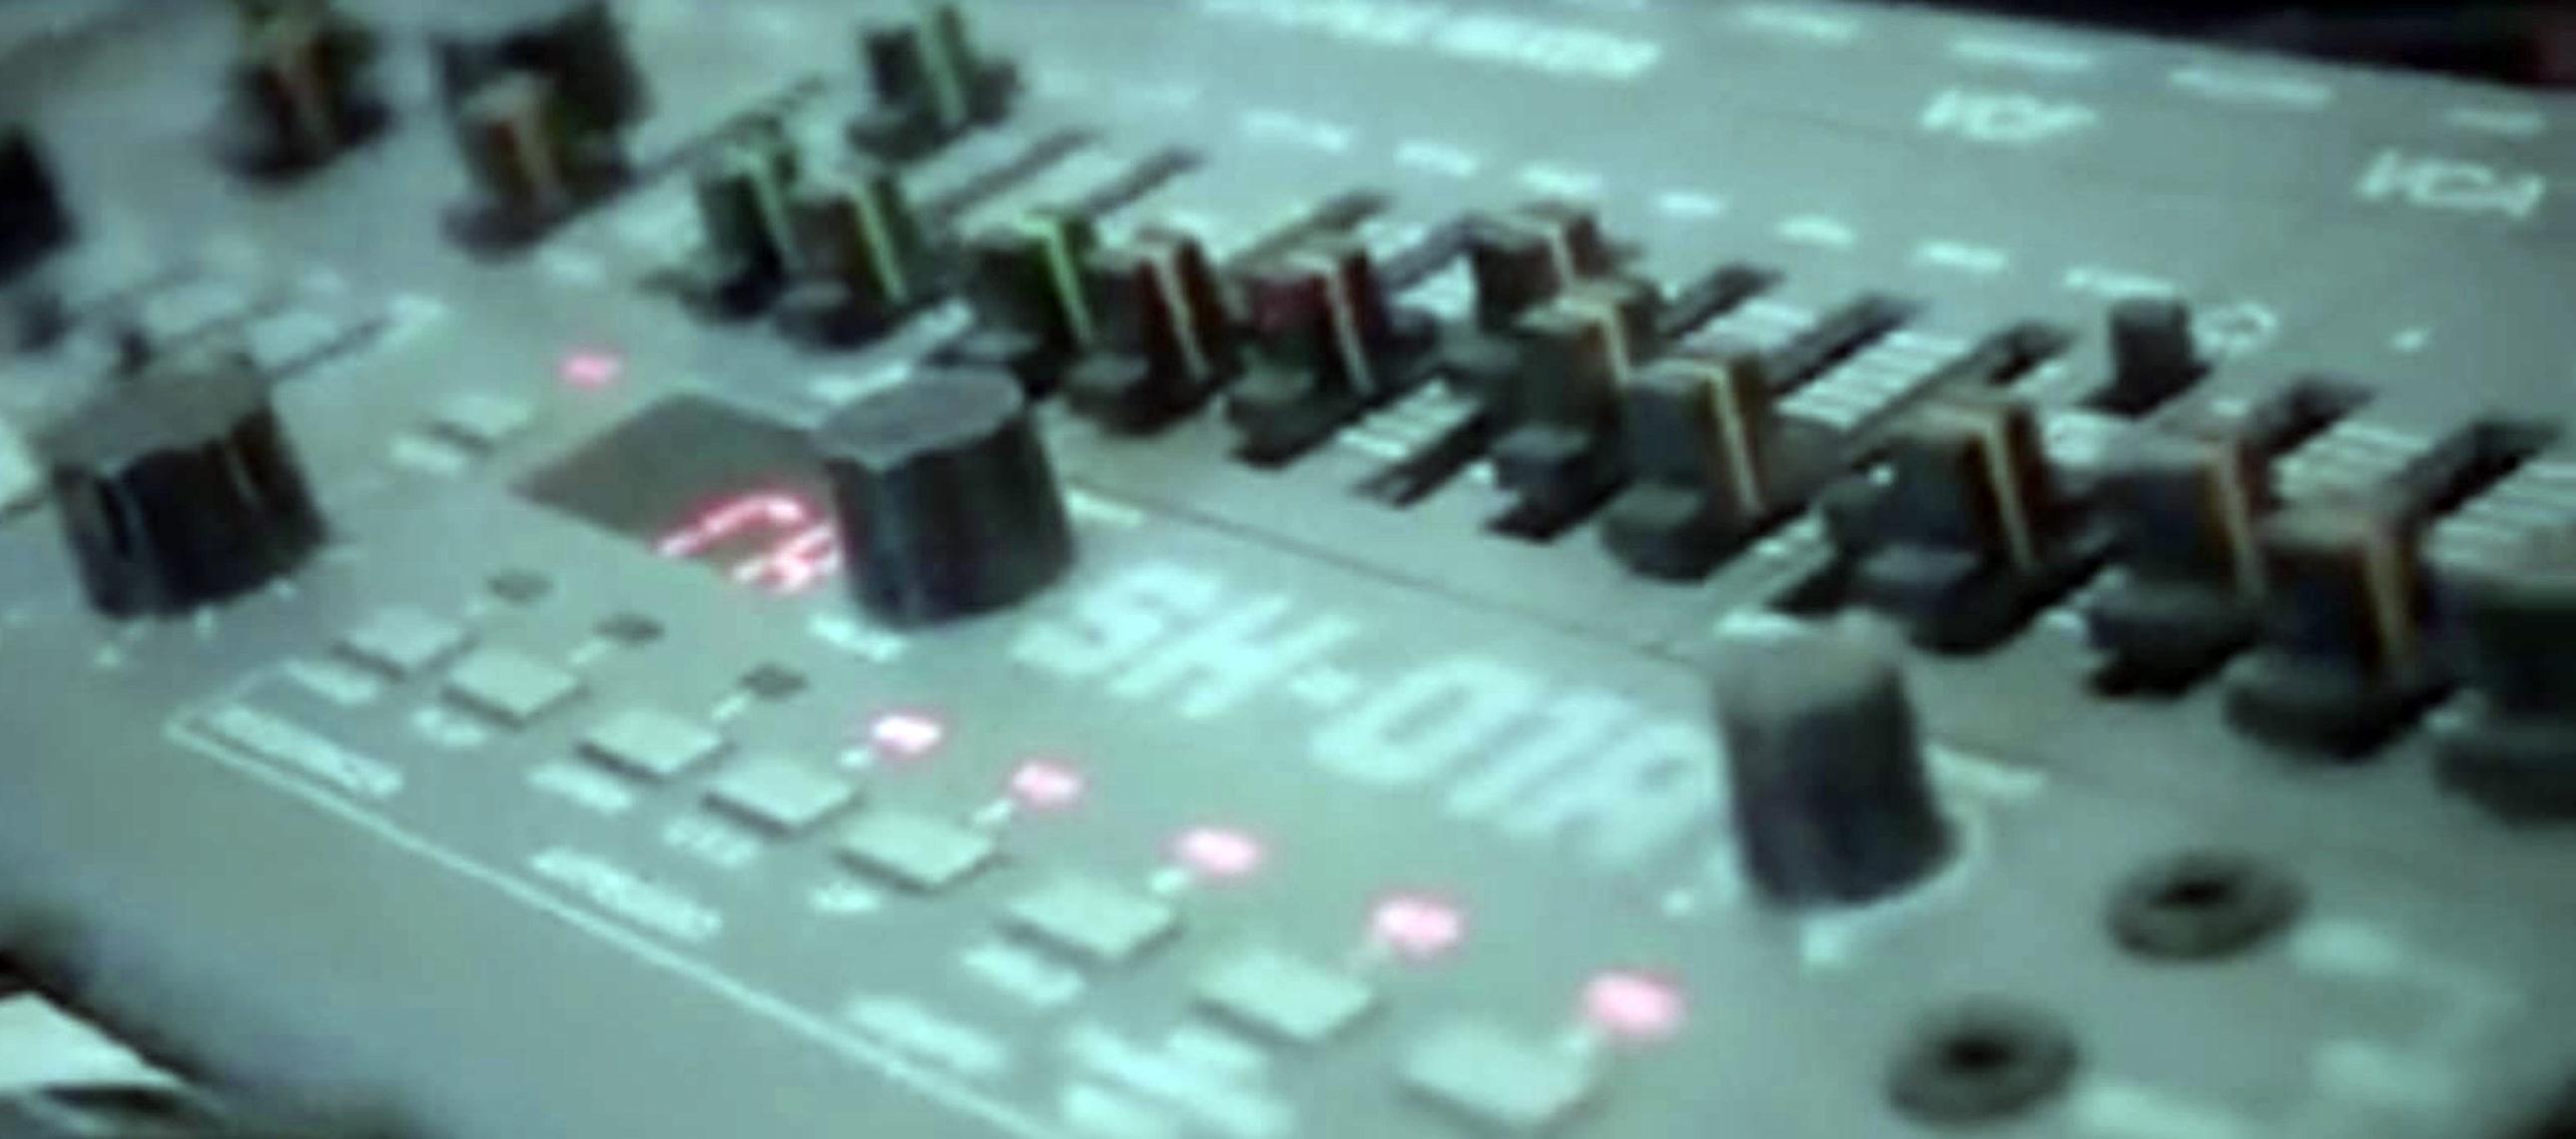 Roland SH101 Boutique: SH-01A + TR-08 Mini TR-808 - Sequencer